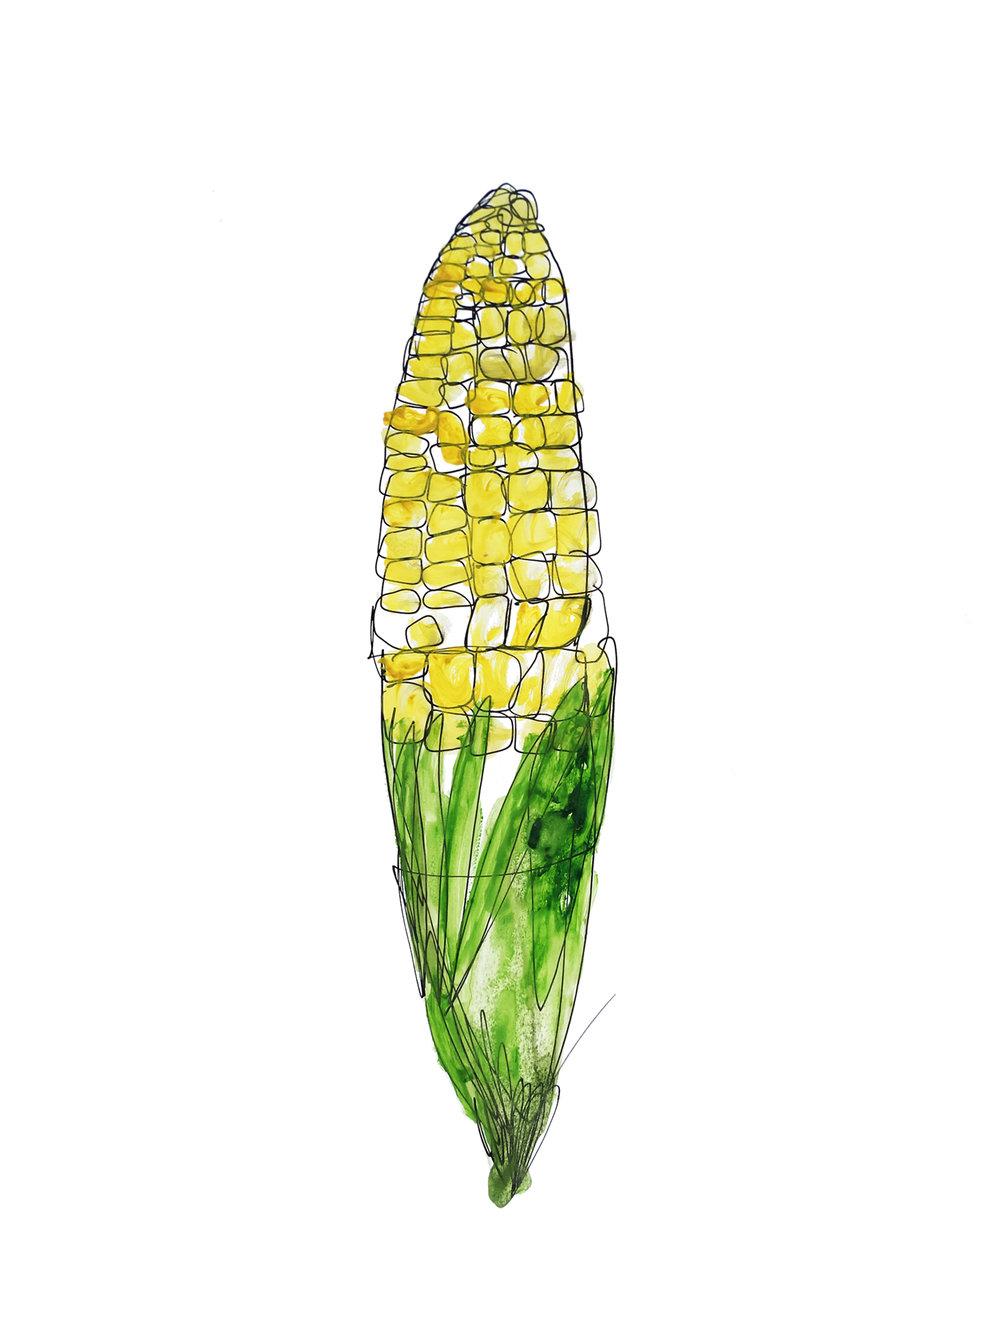 Thecornisreadyforharvest.jpg